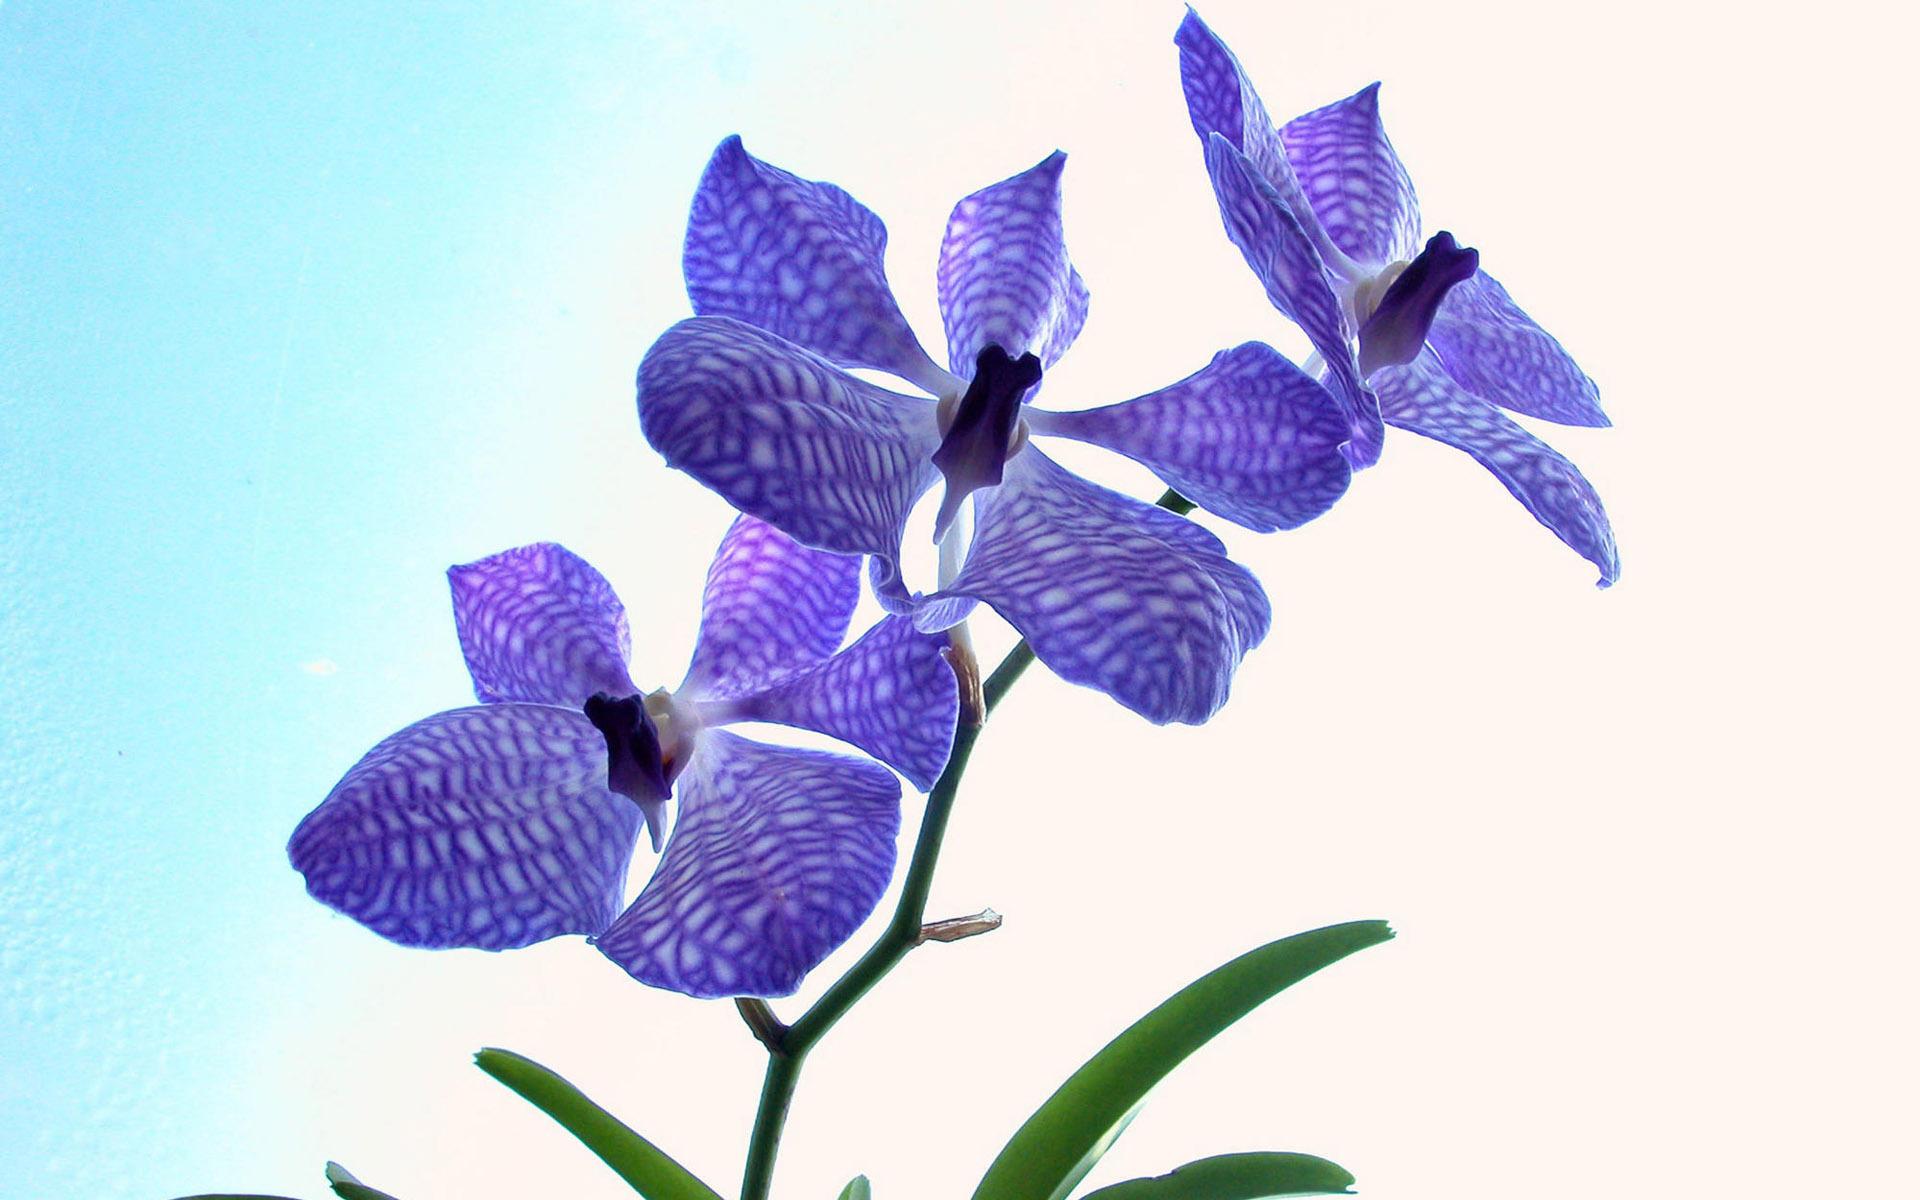 Shenzhen Nongke Orchid Desktop